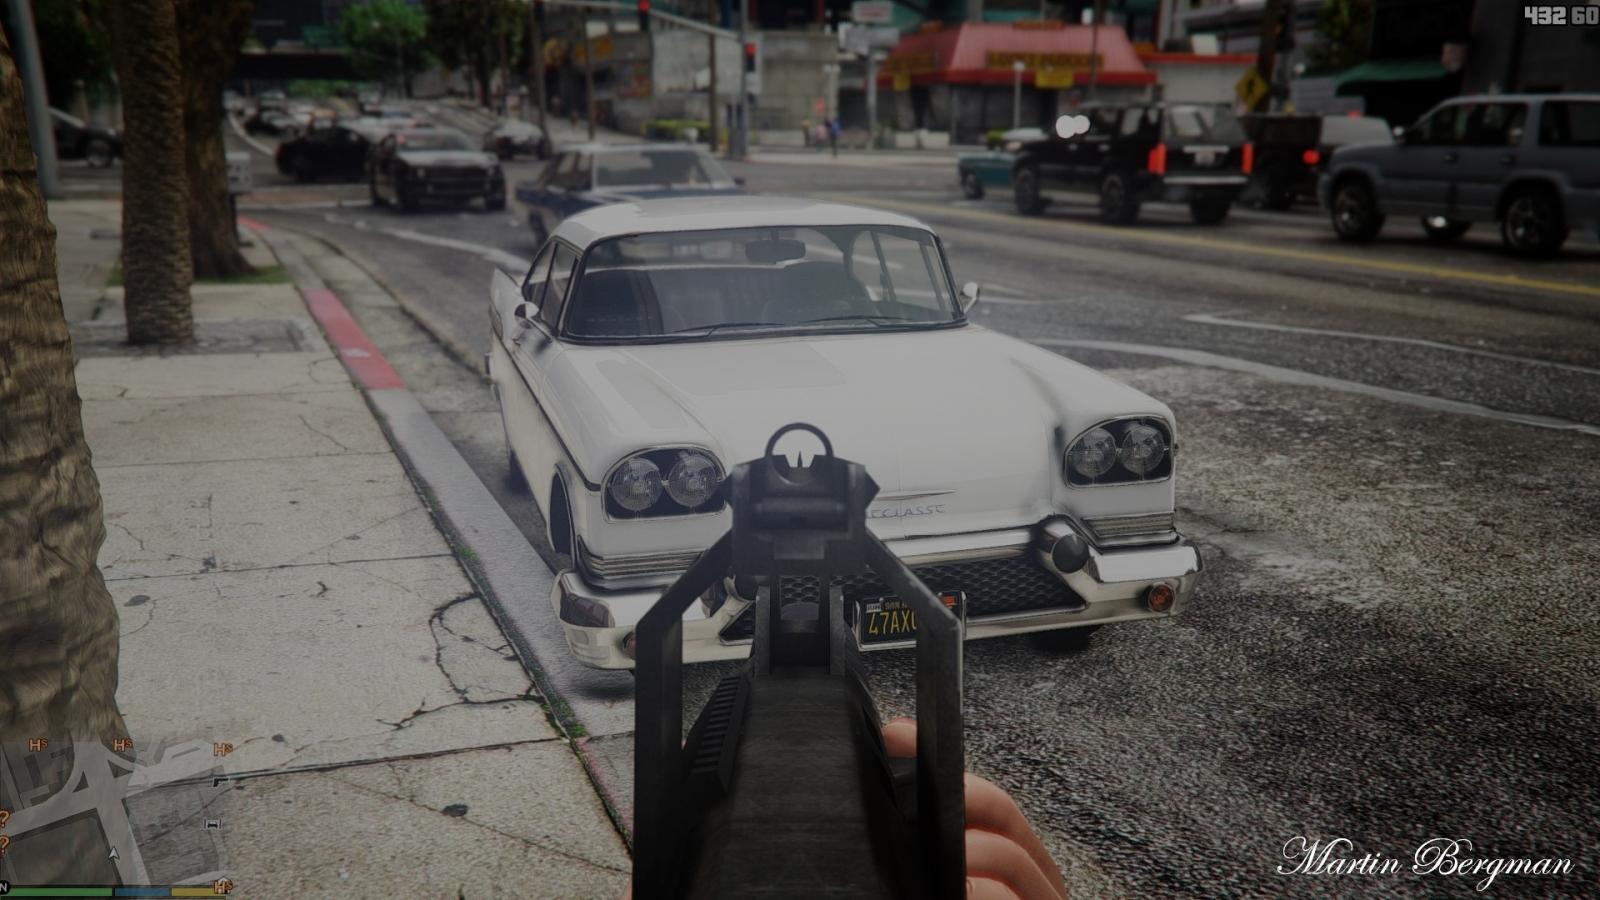 GTA 5 realism mod